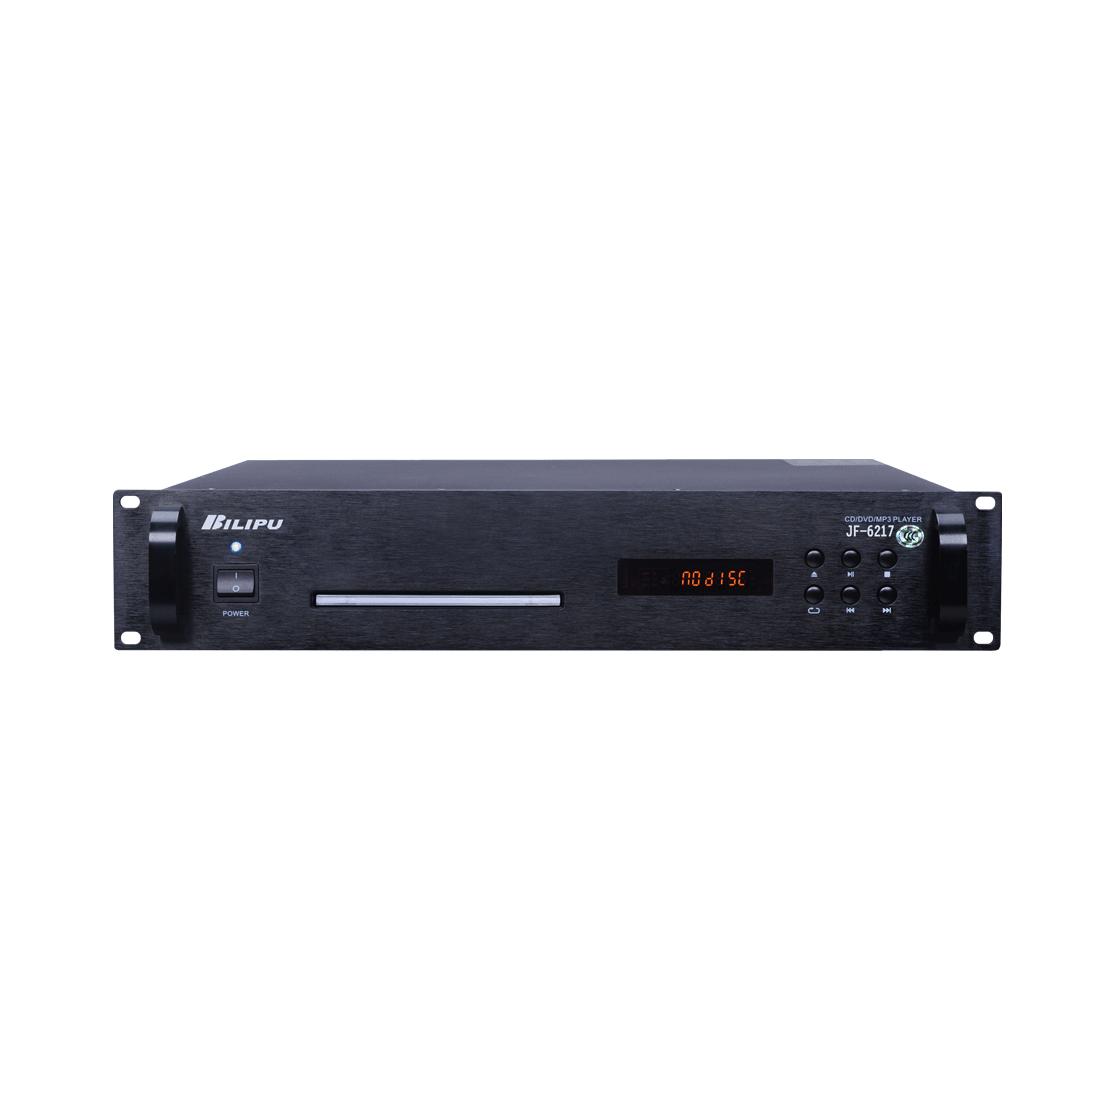 JF-6217 受控数字播放器